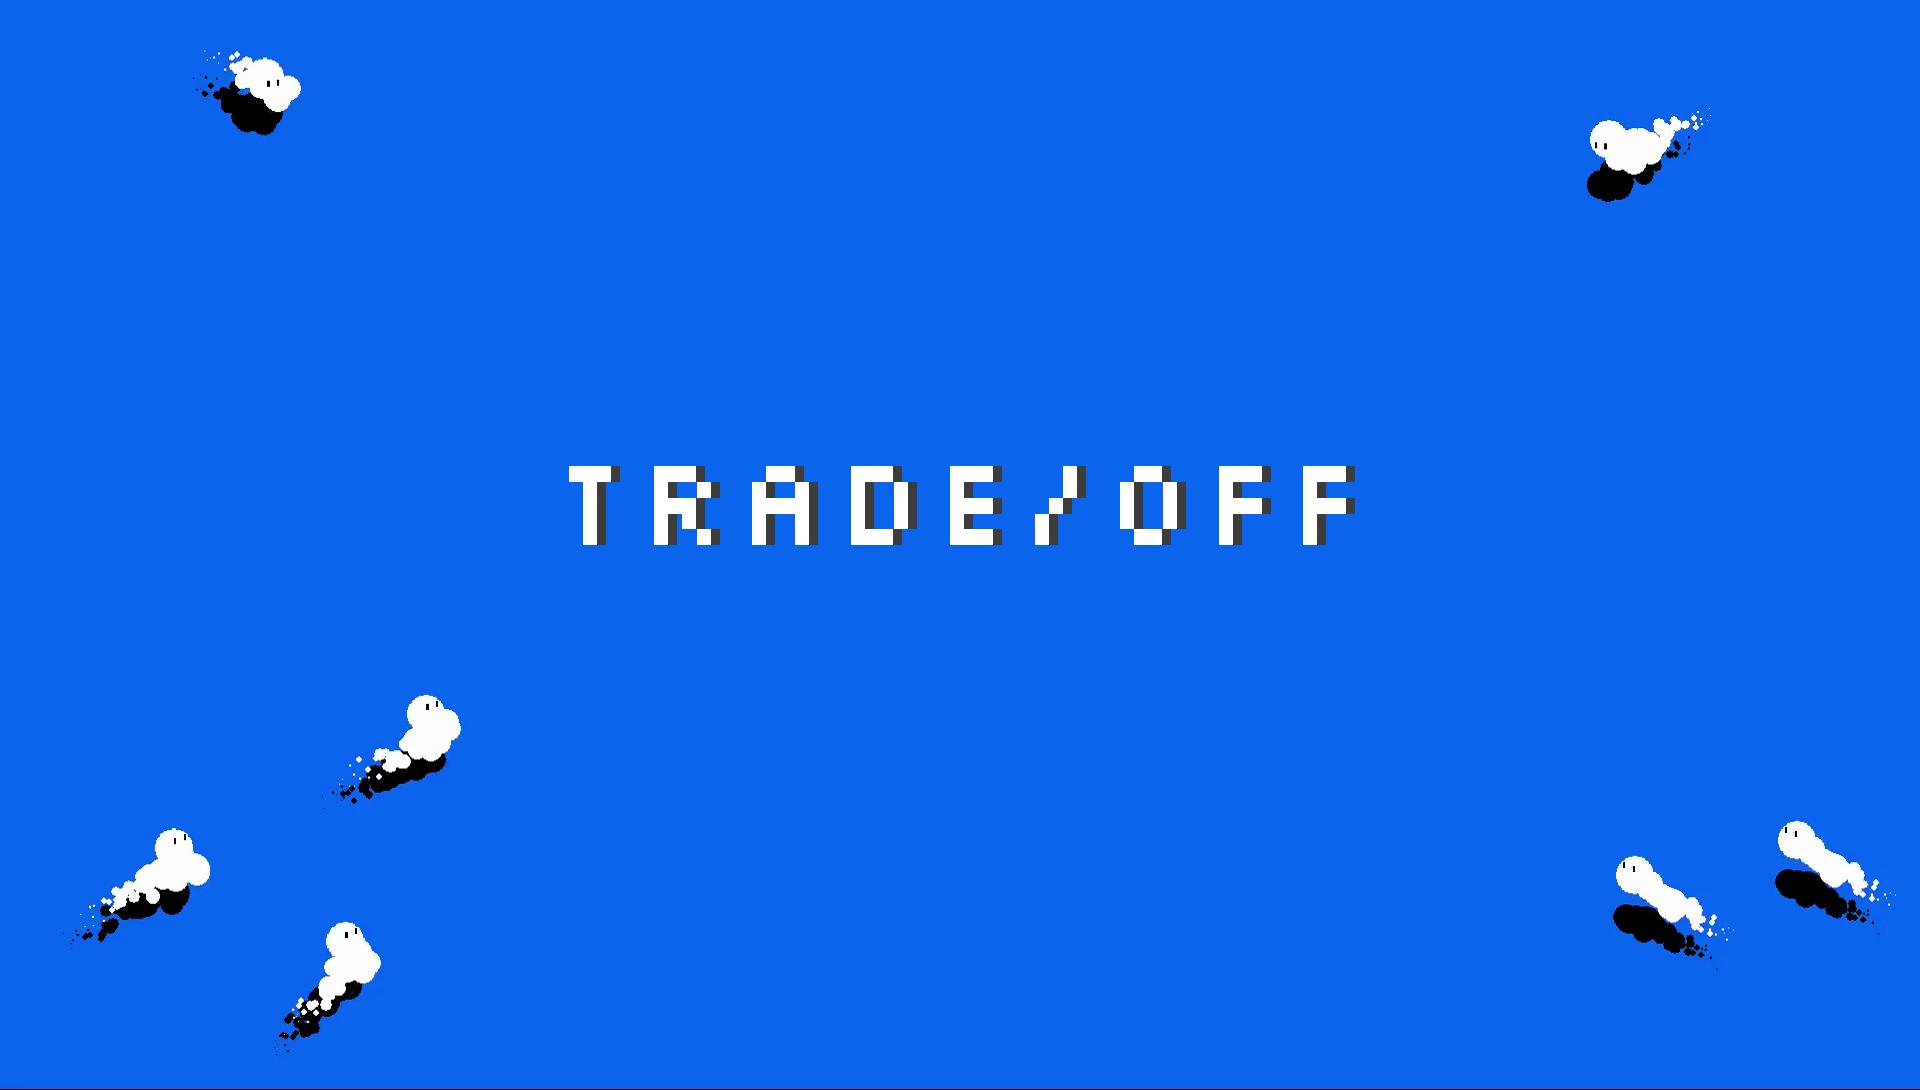 Trade/Off